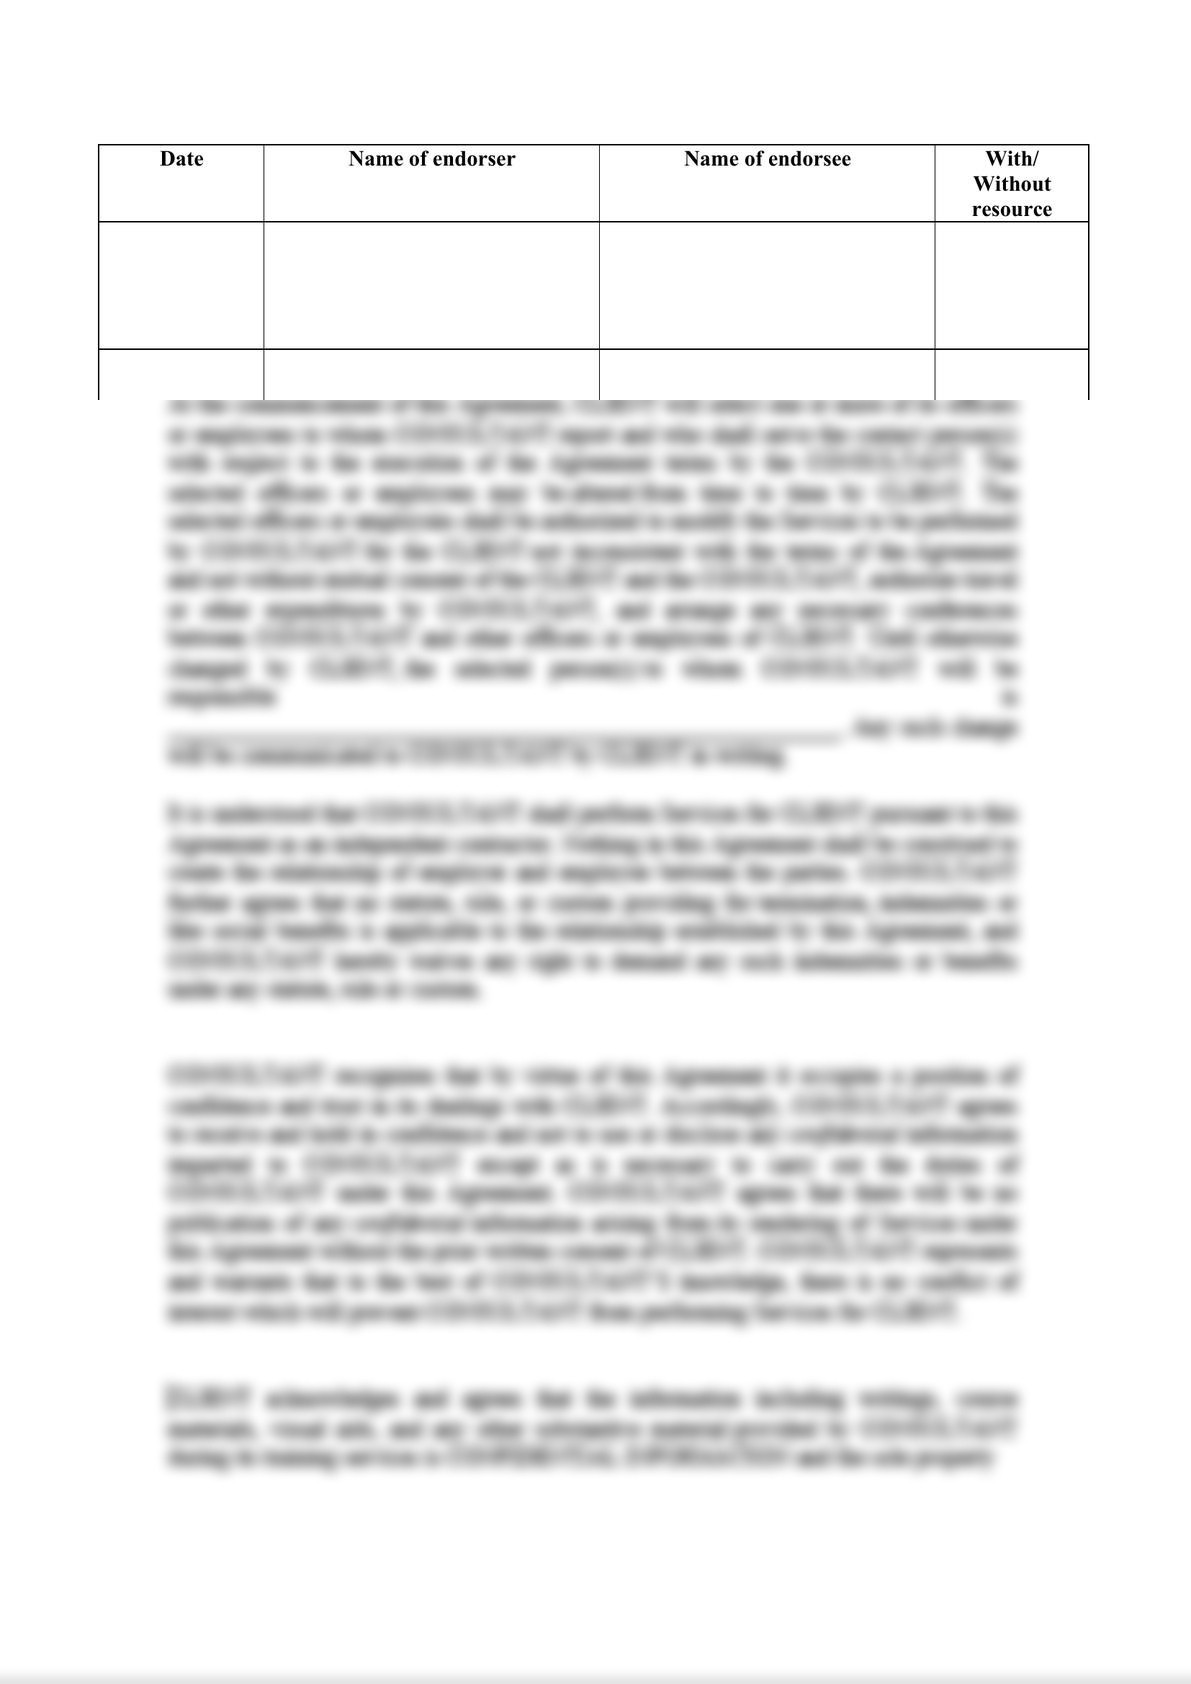 Promissory Note-1